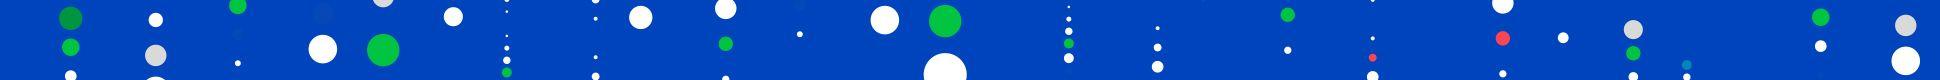 ITEA 4 page header azure dots